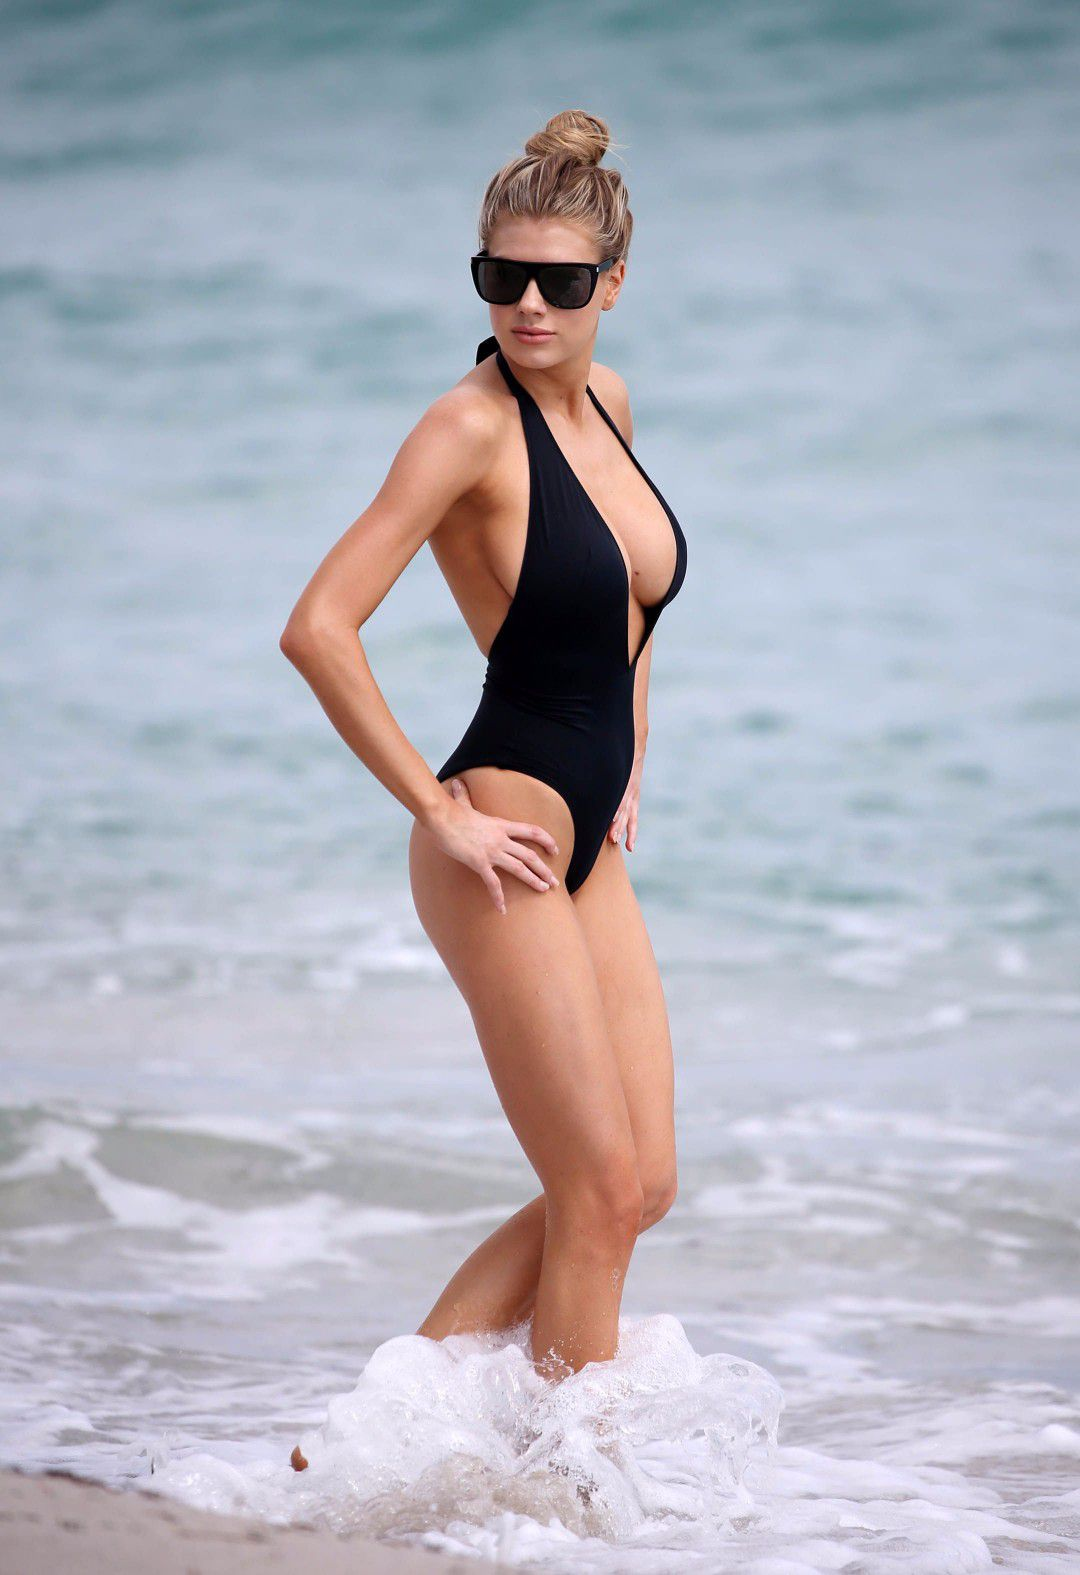 charlotte-mckinney-nipple-slip-at-the-beach-in-miami-09